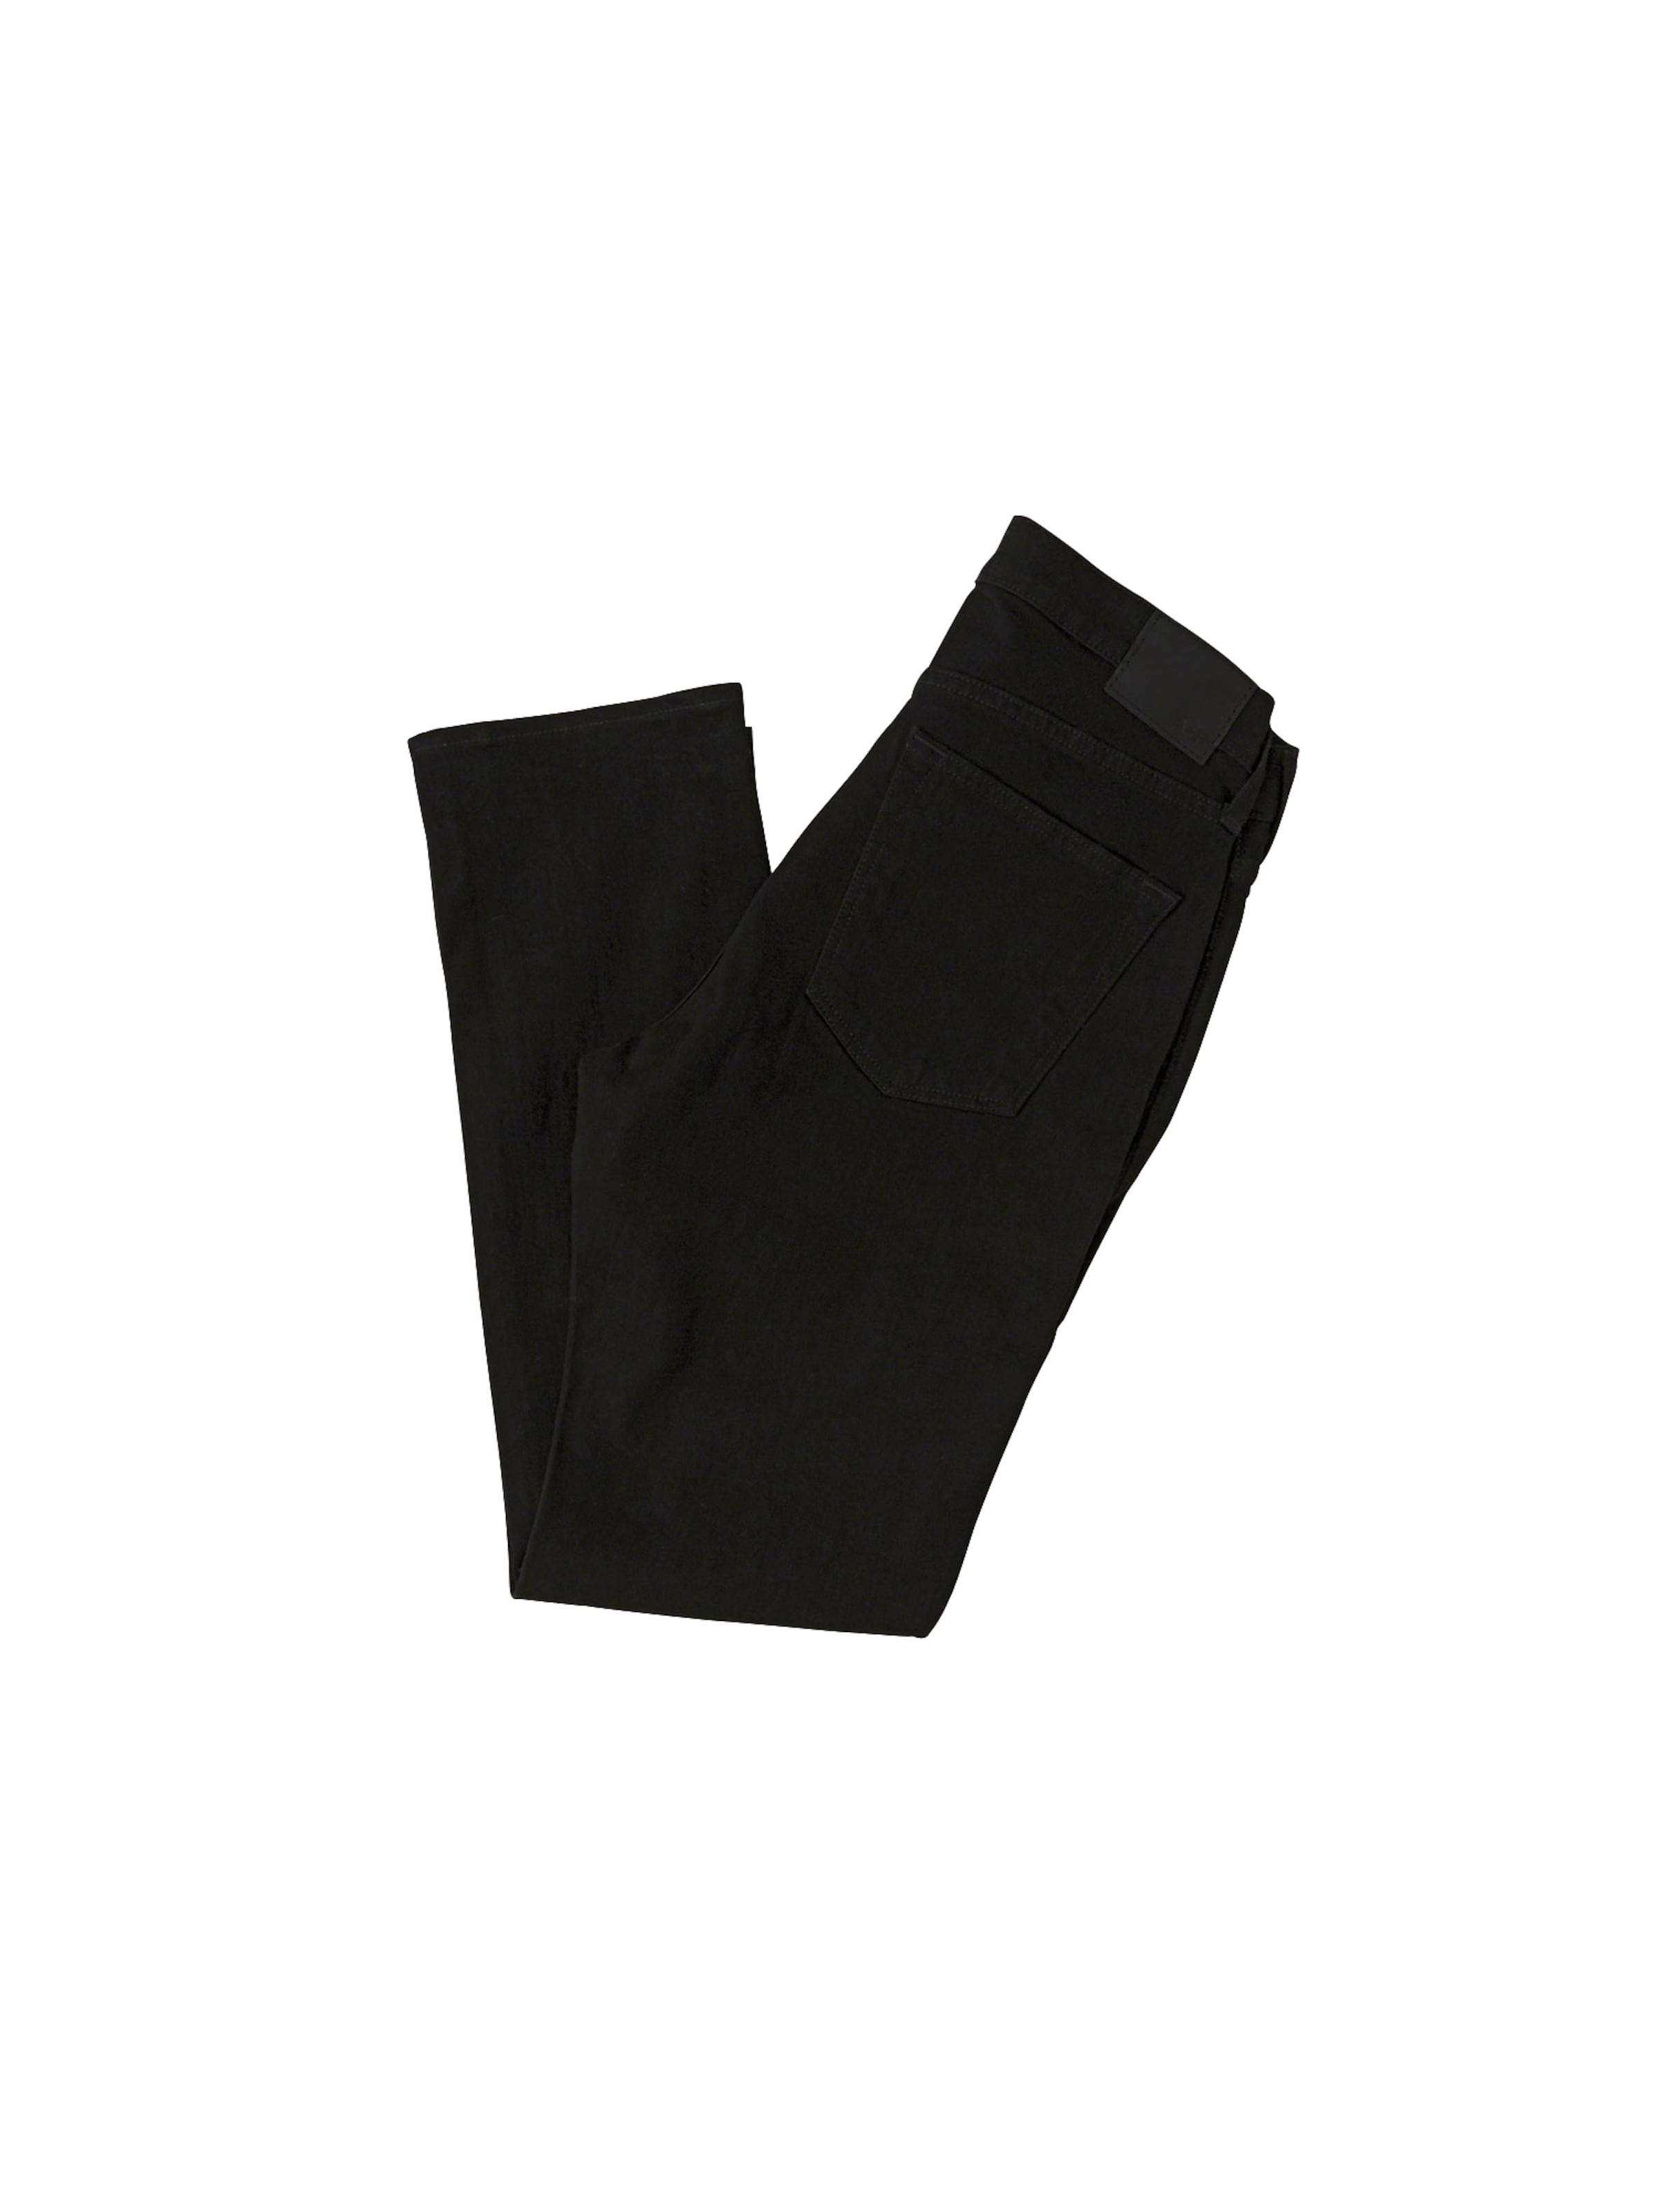 Black Jeans Denim In Abercrombieamp; Fitch rshtdCQ